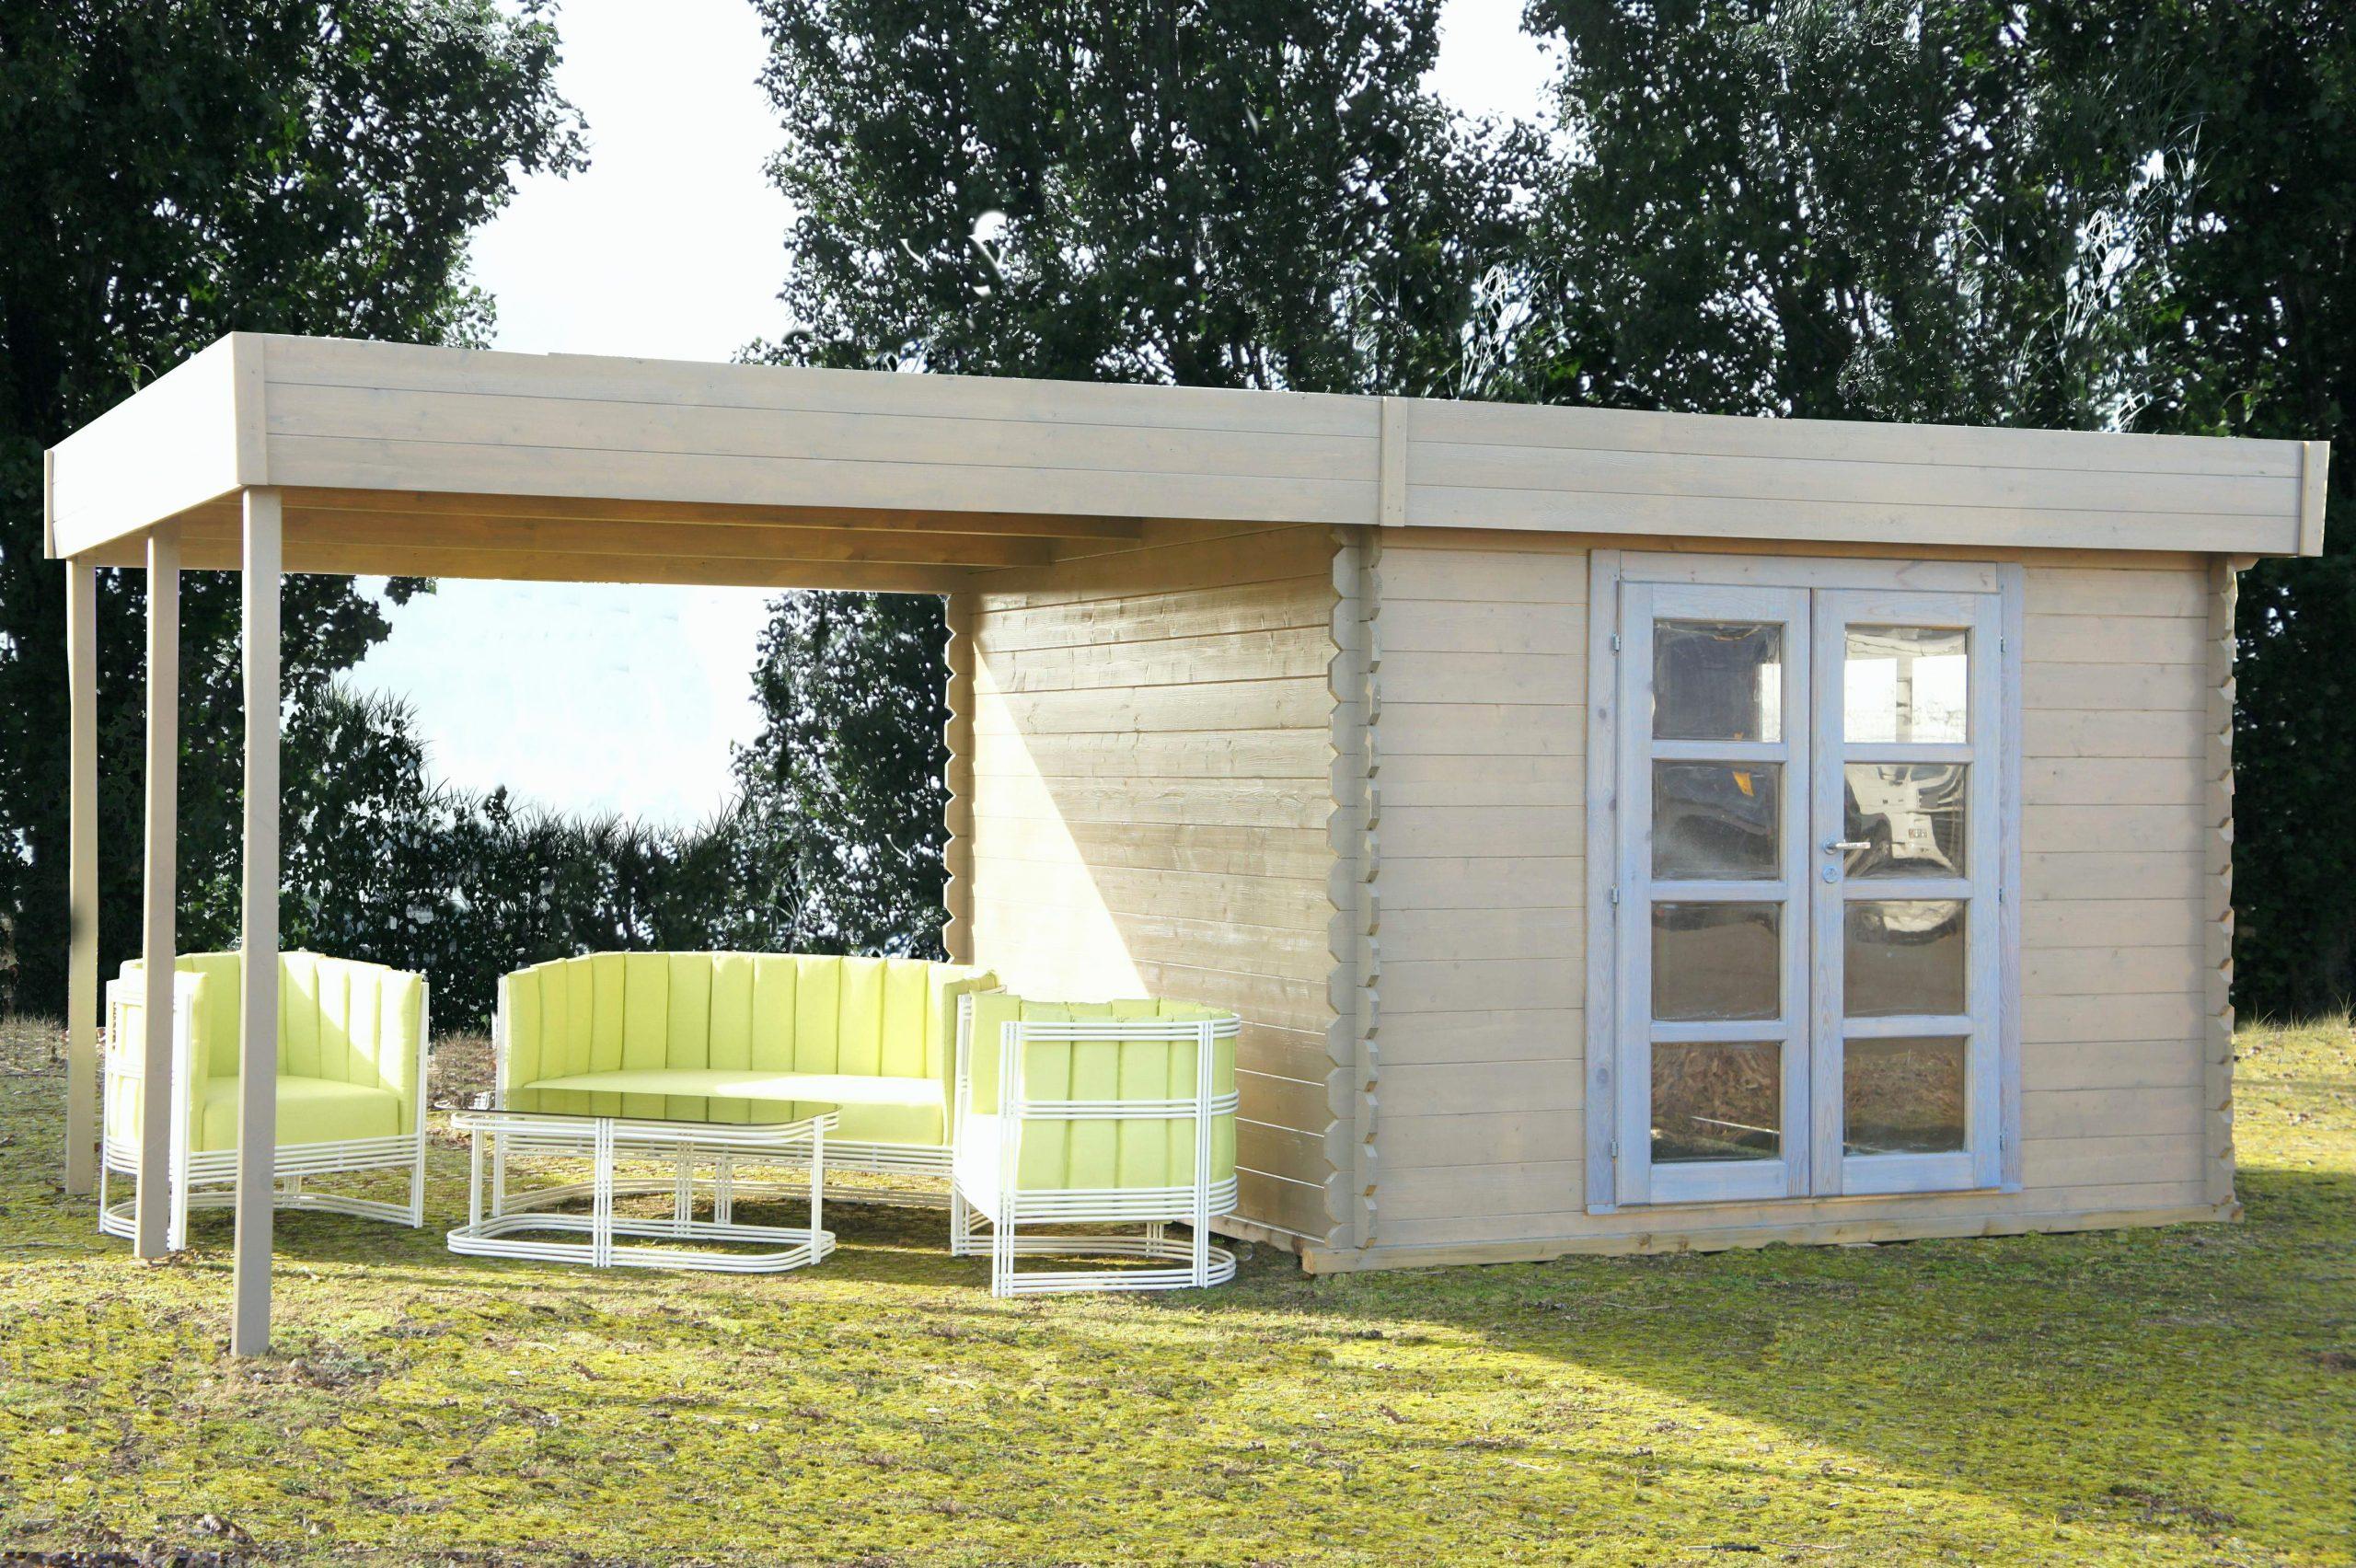 Salon De Jardin Carrefour Bois - The Best Undercut pour Abri De Jardin En Bois Carrefour